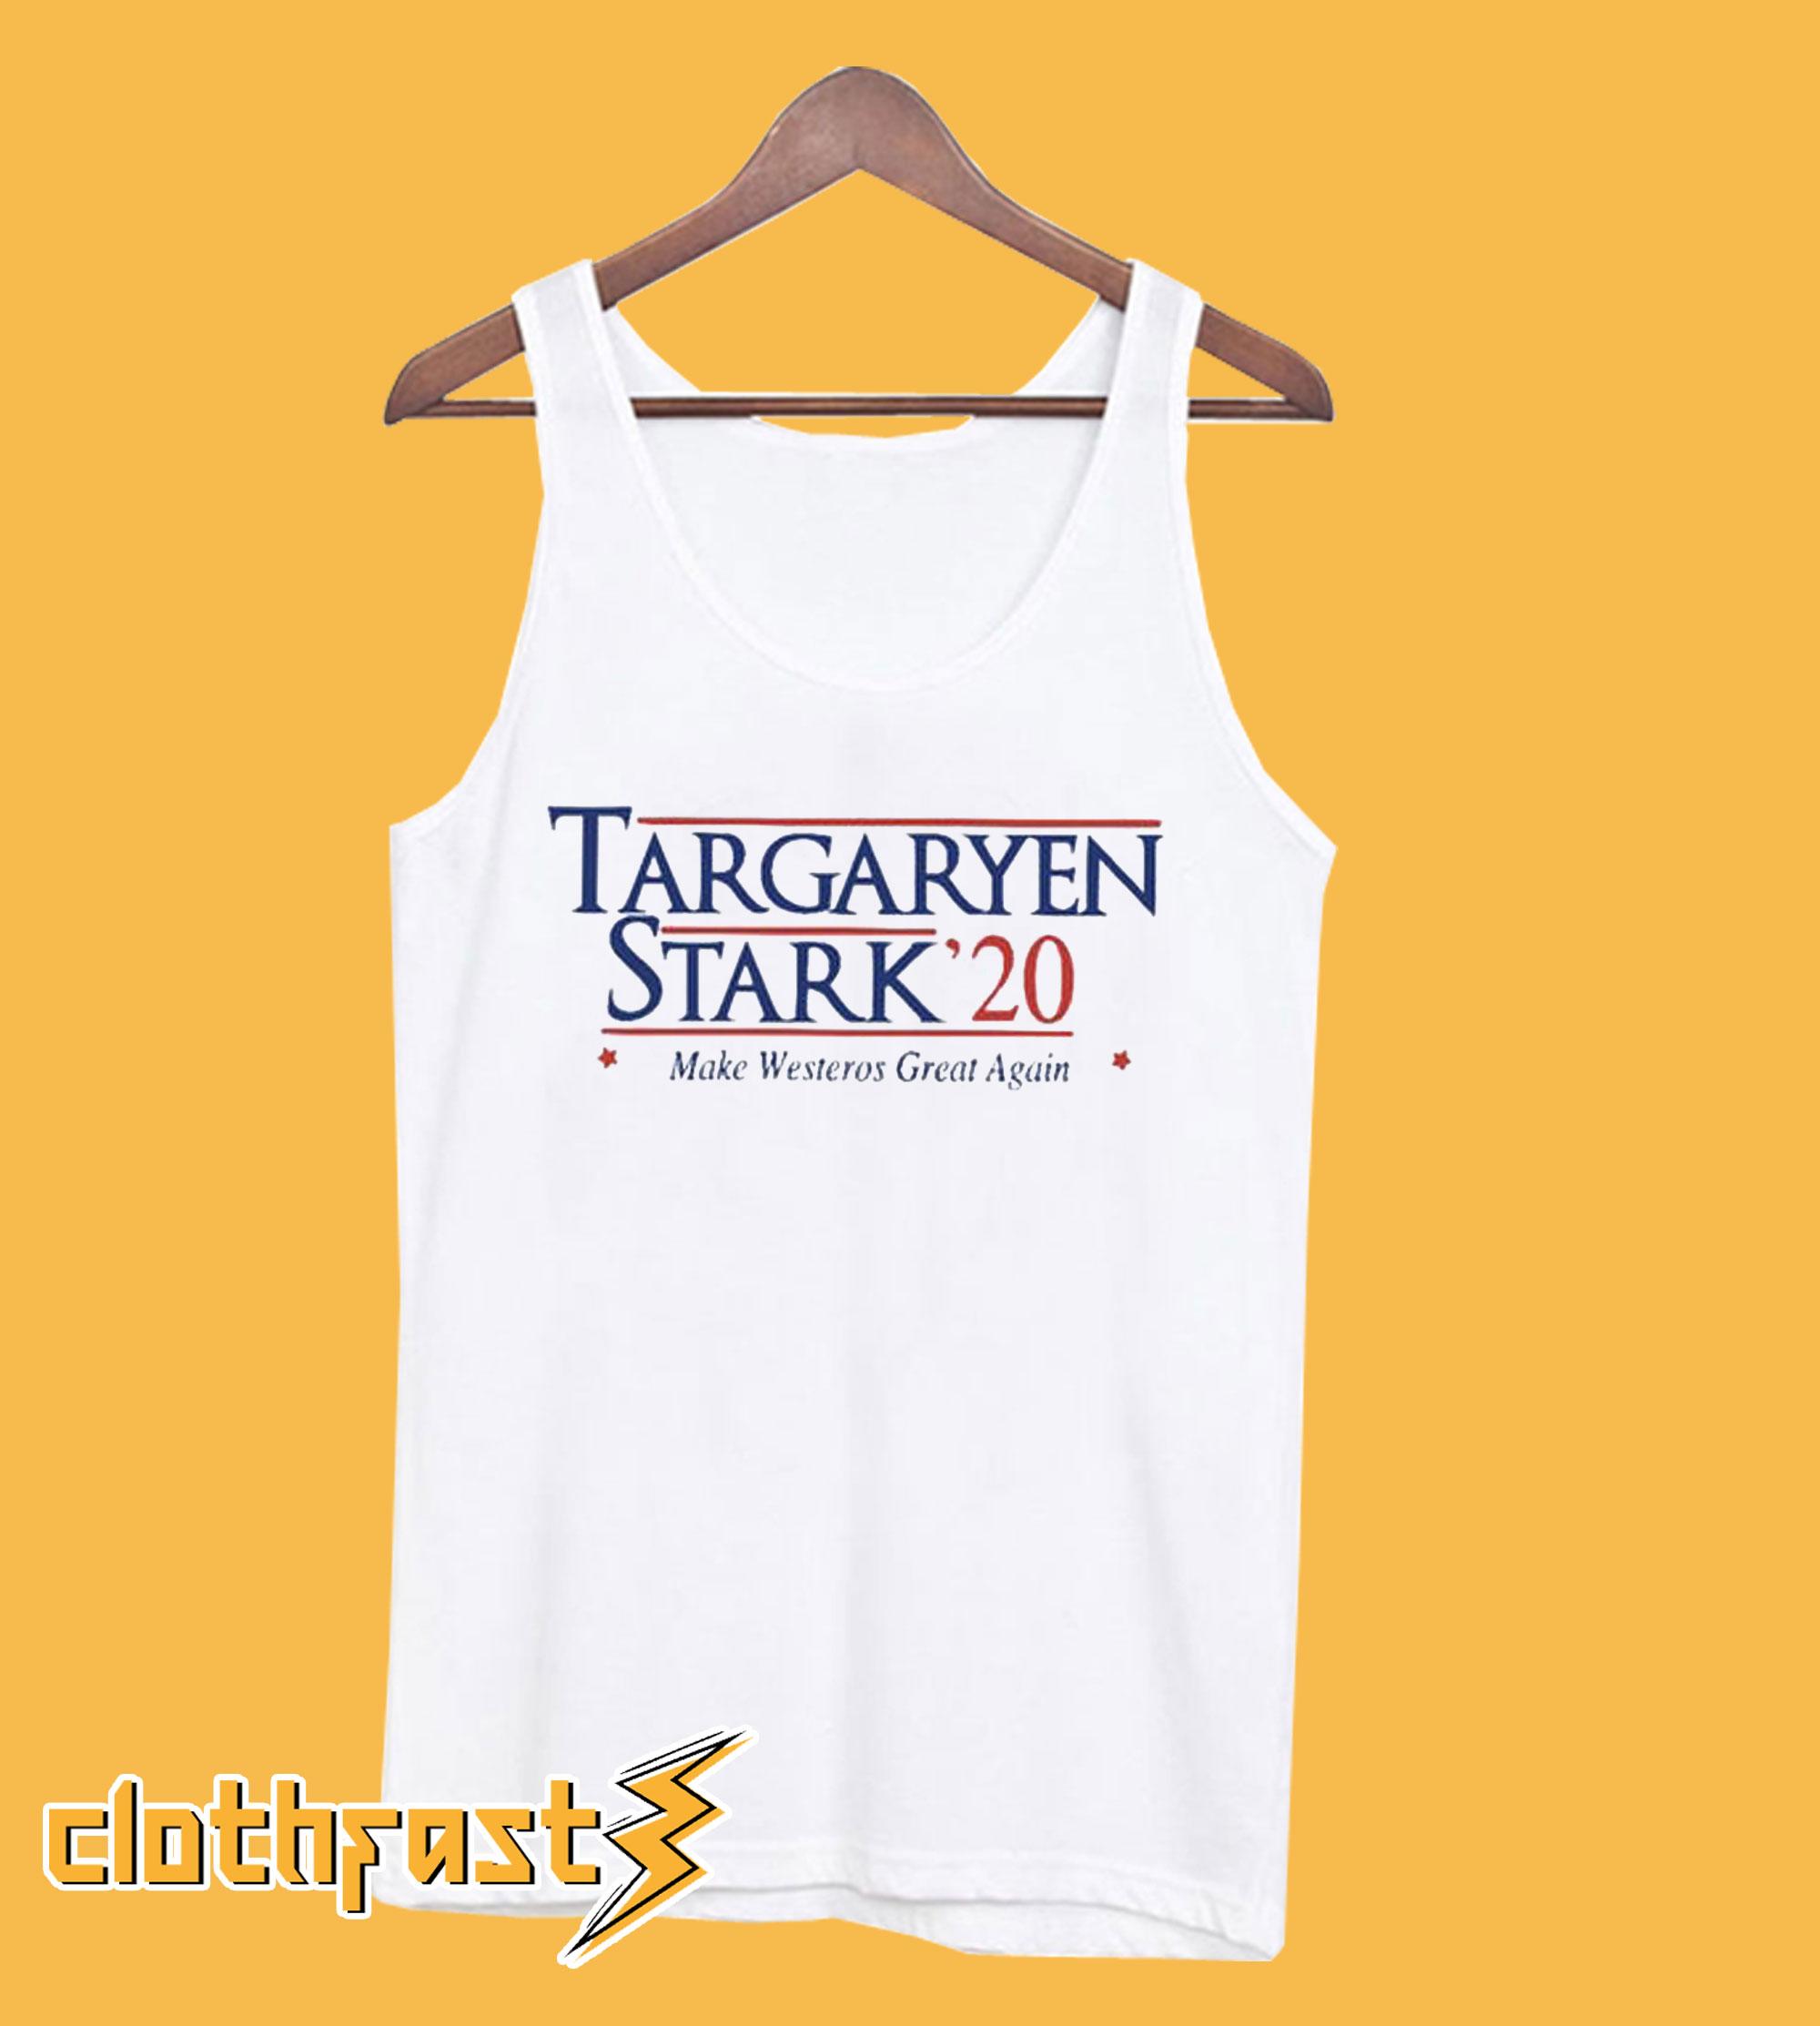 Targaryen Stark '20 Tanktop